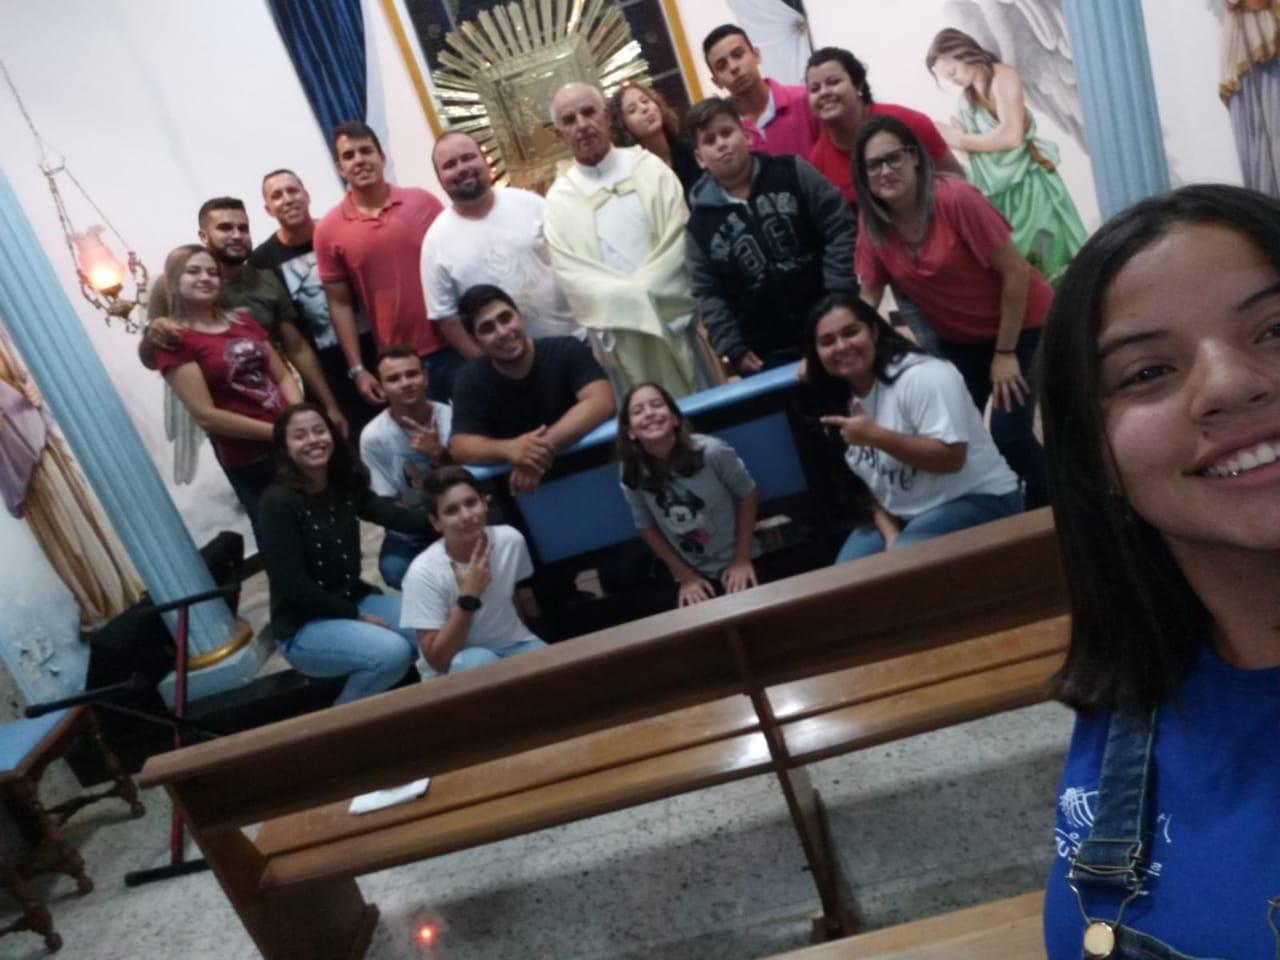 Grupo de jovens Ágape de Pereiras promoveu momento de espiritualidade